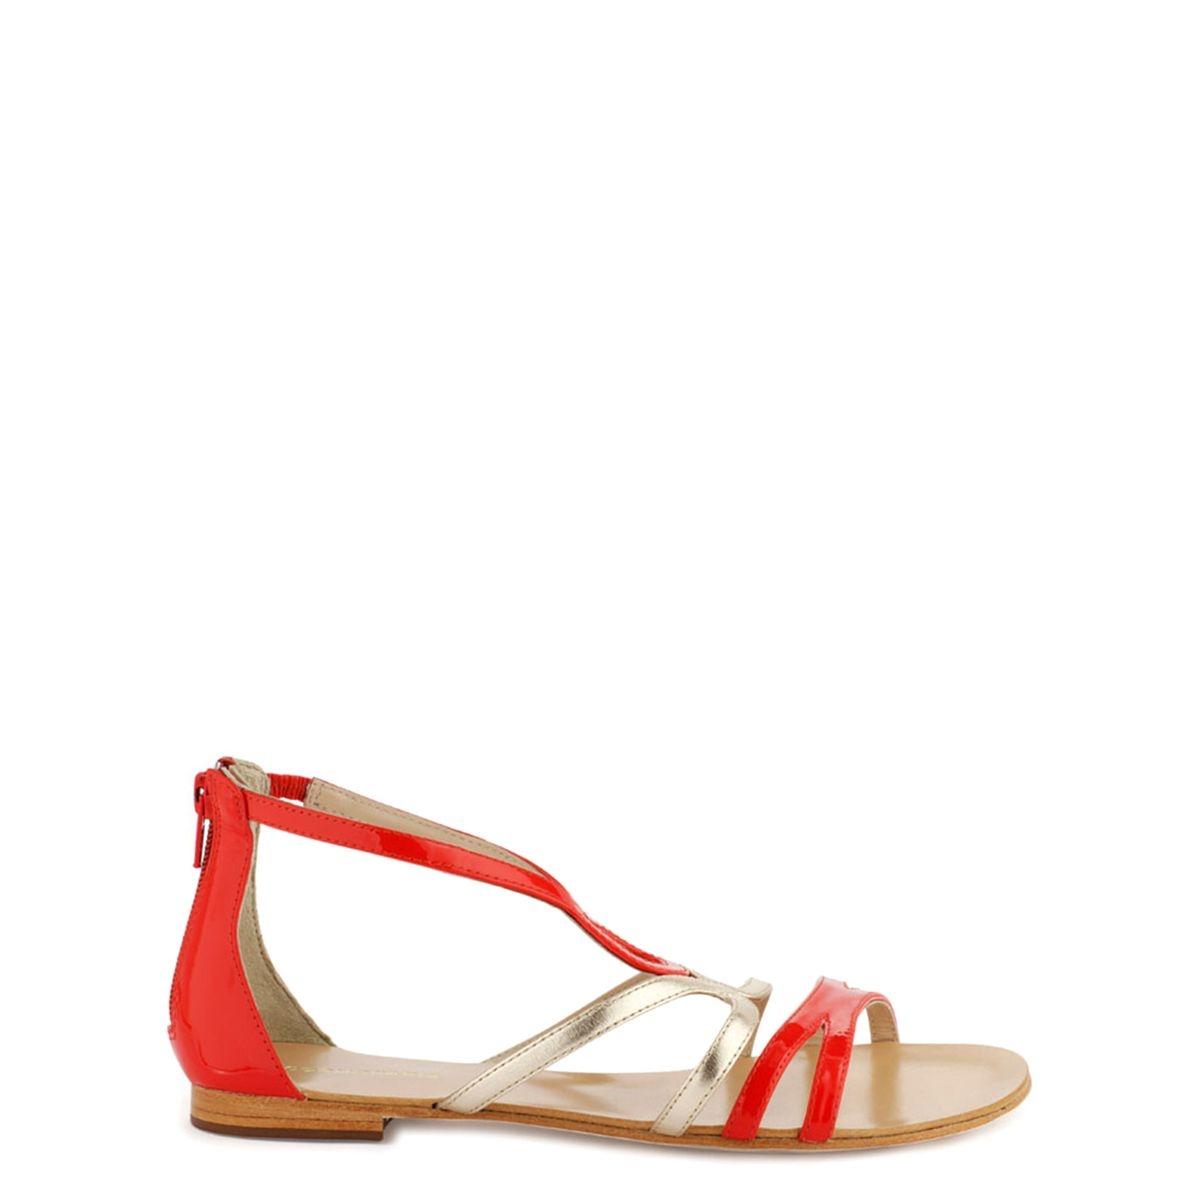 Sandales cuir Kiloa